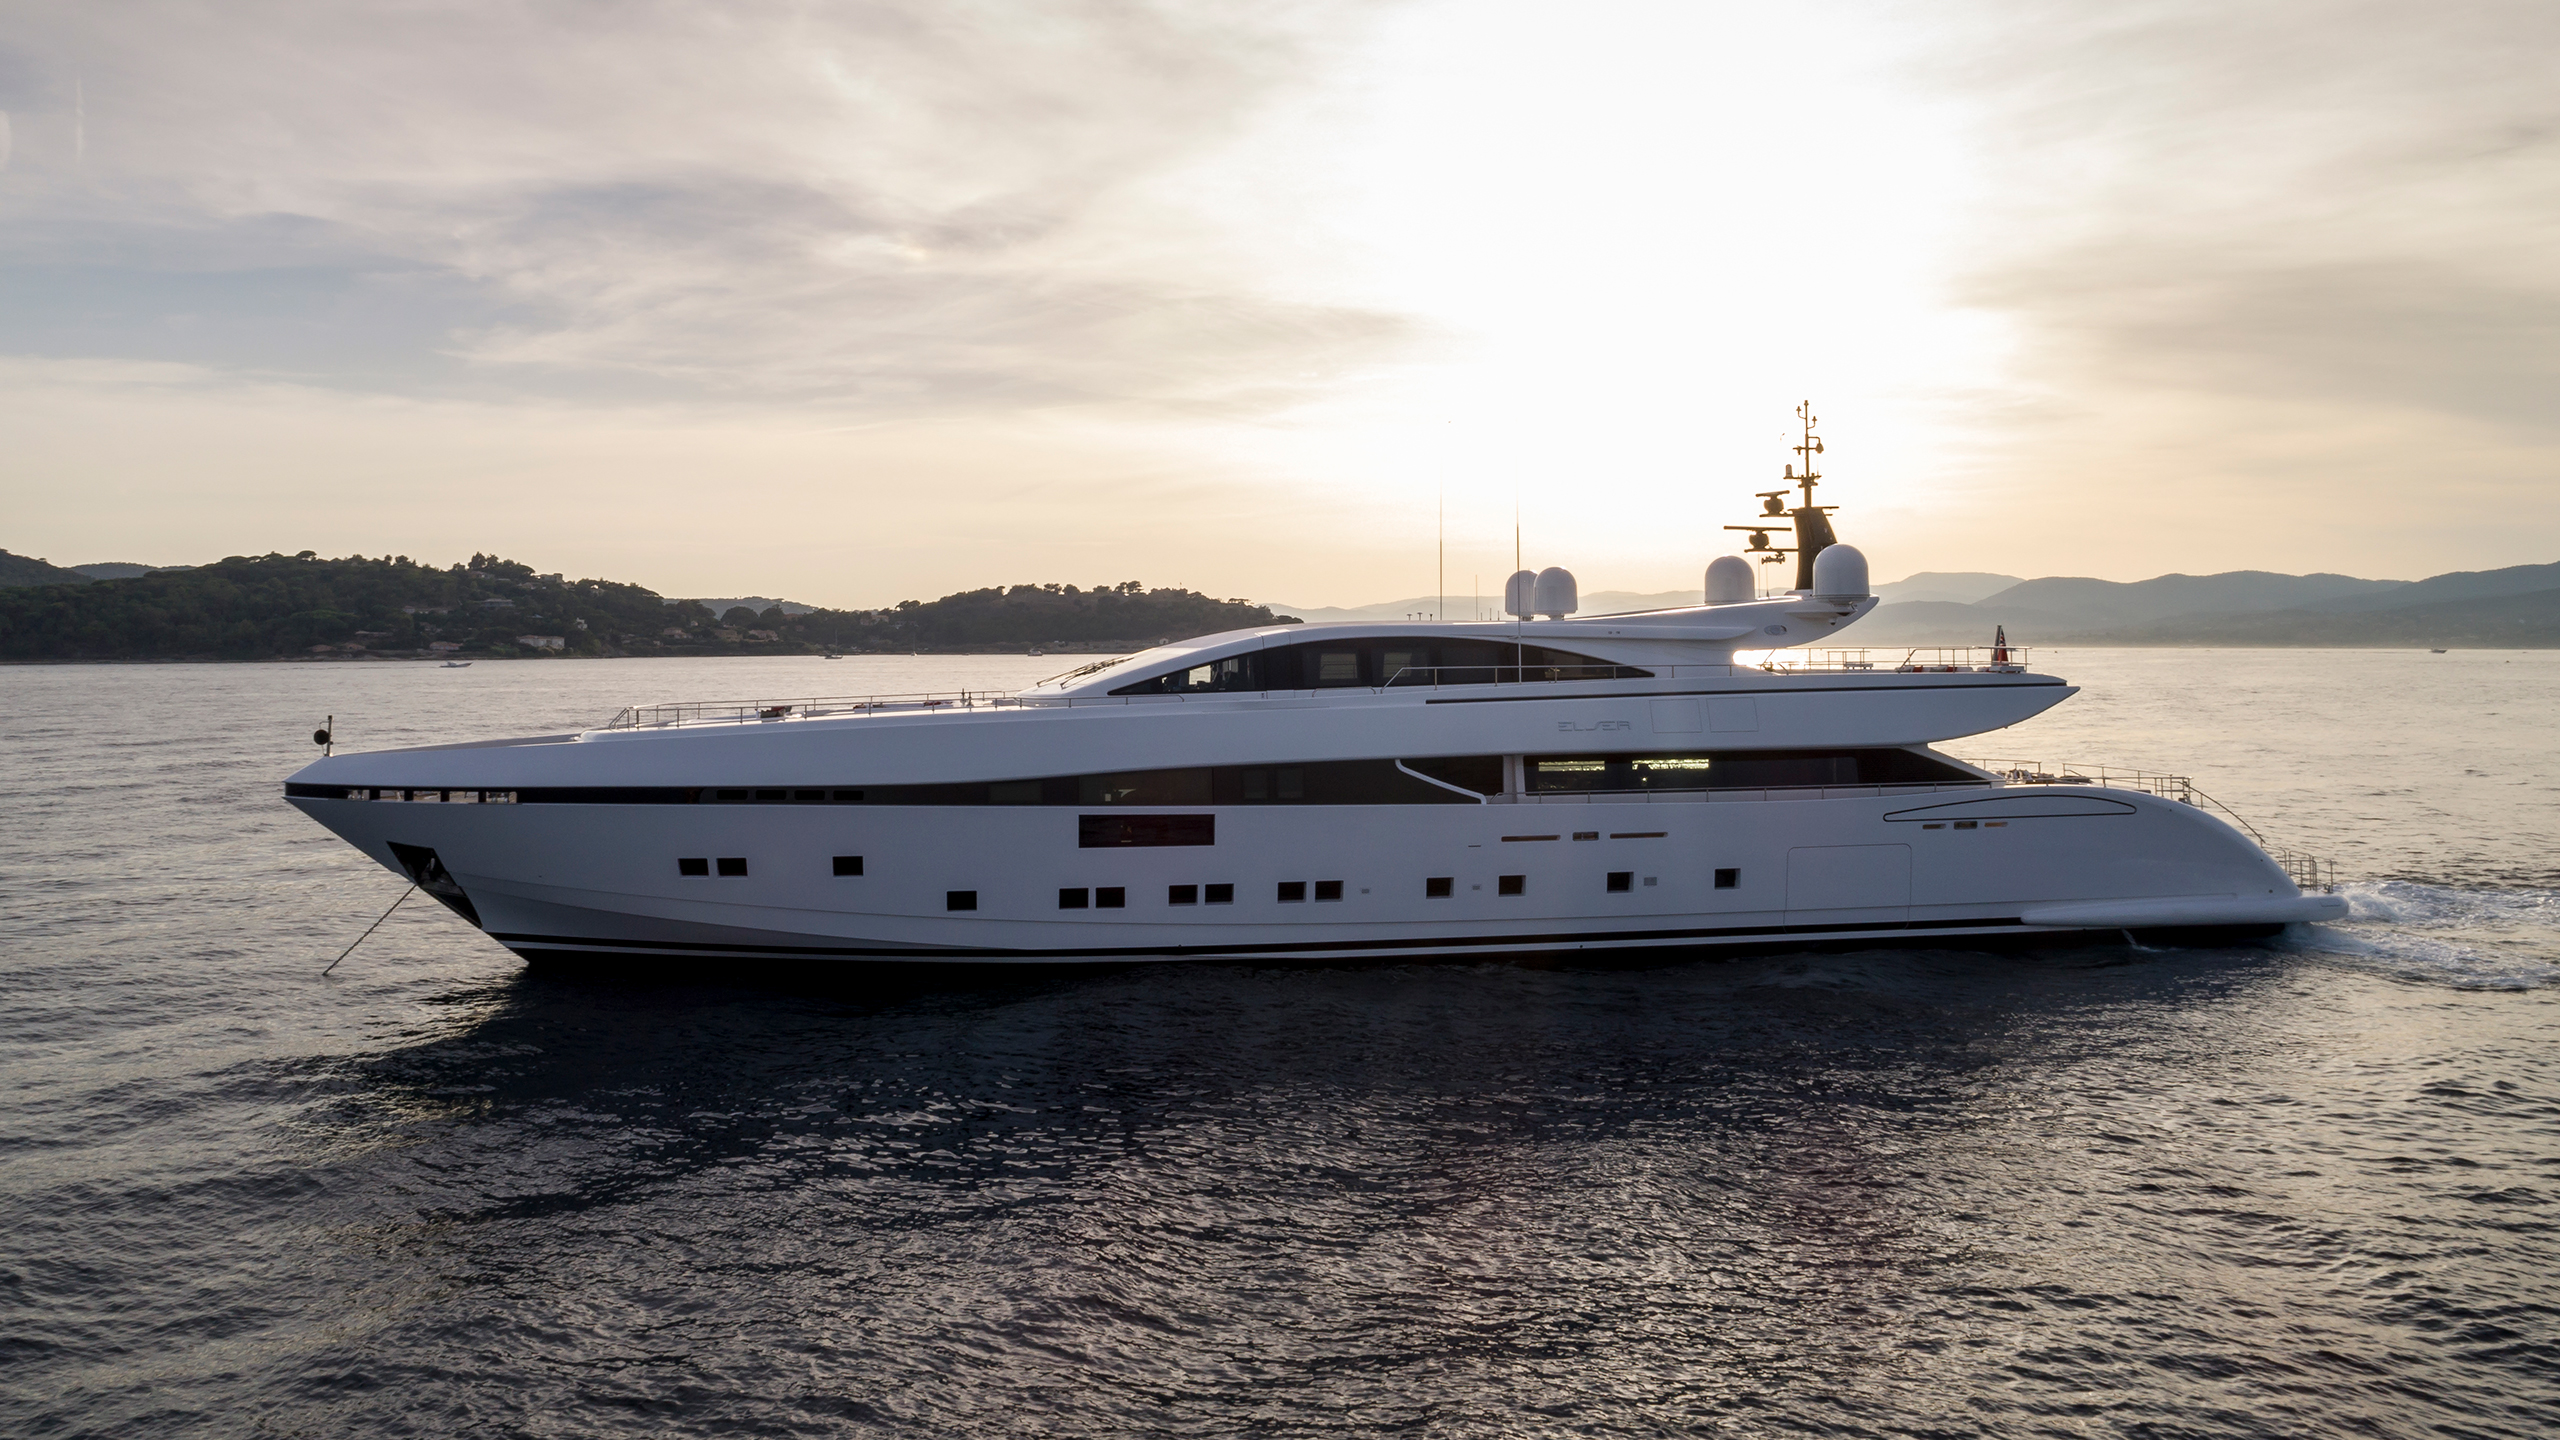 side-view-of-the-cerri-cantieri-navali-custom-superyacht-elsea-credit-Nico-Fulciniti